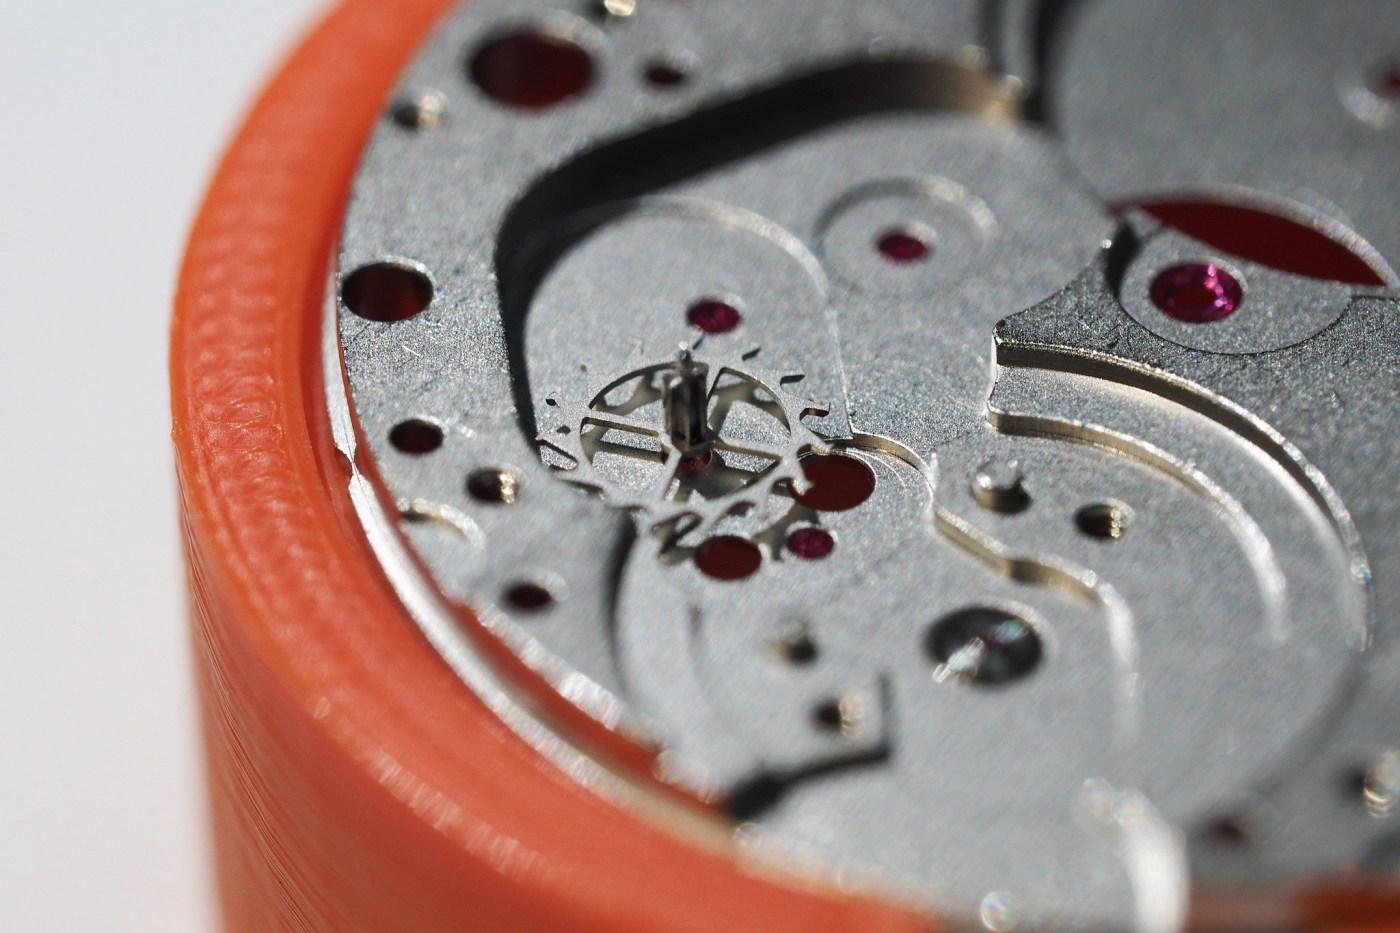 Install escape wheel in ETA 6497-1 baseplate